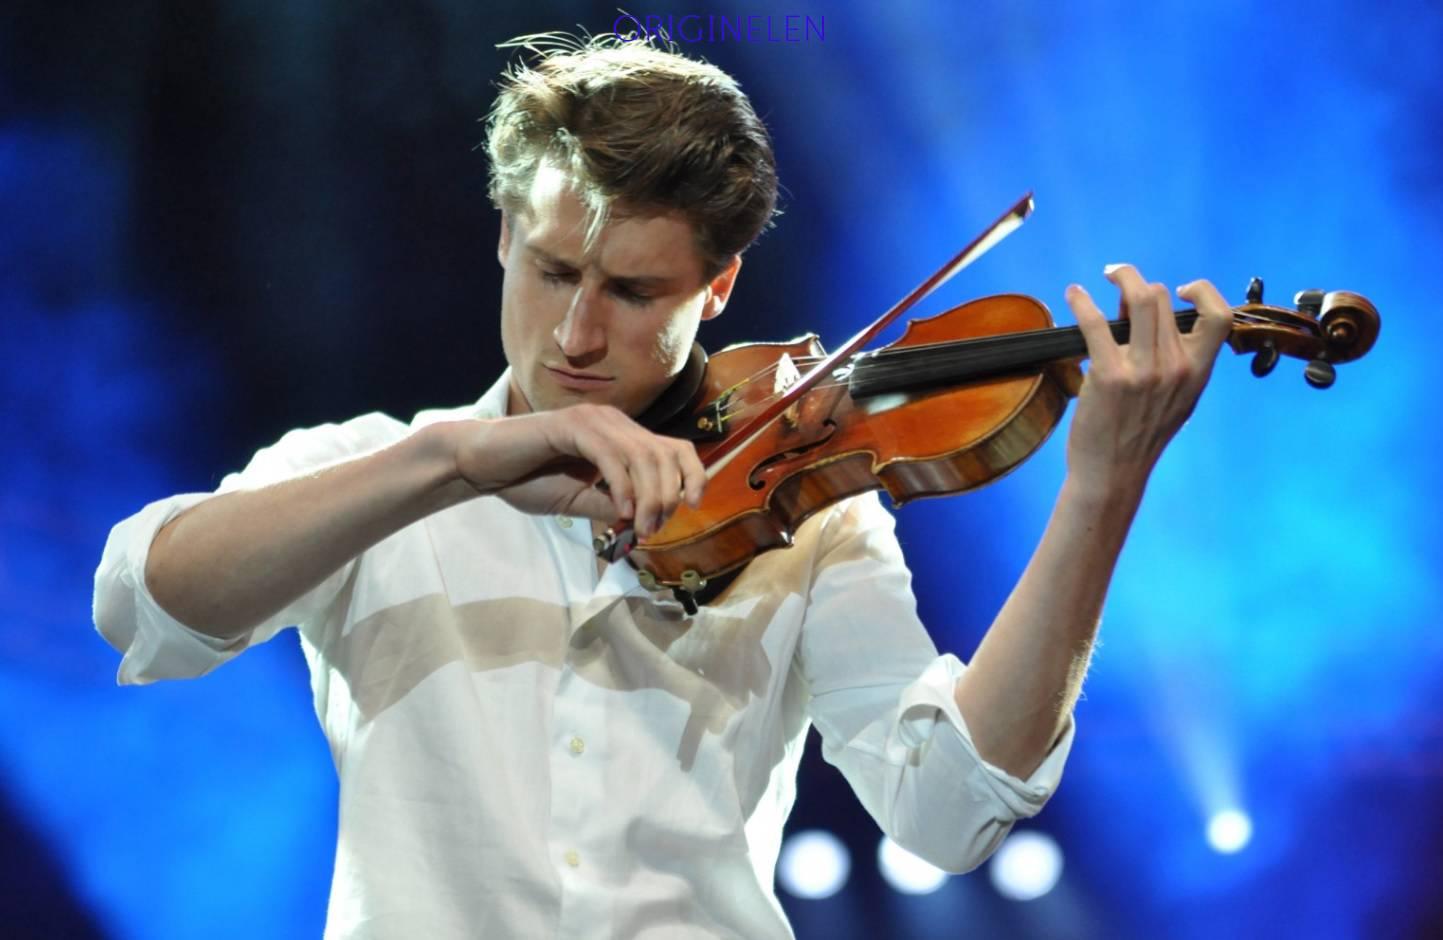 Afgesloten - Concert in Bozar